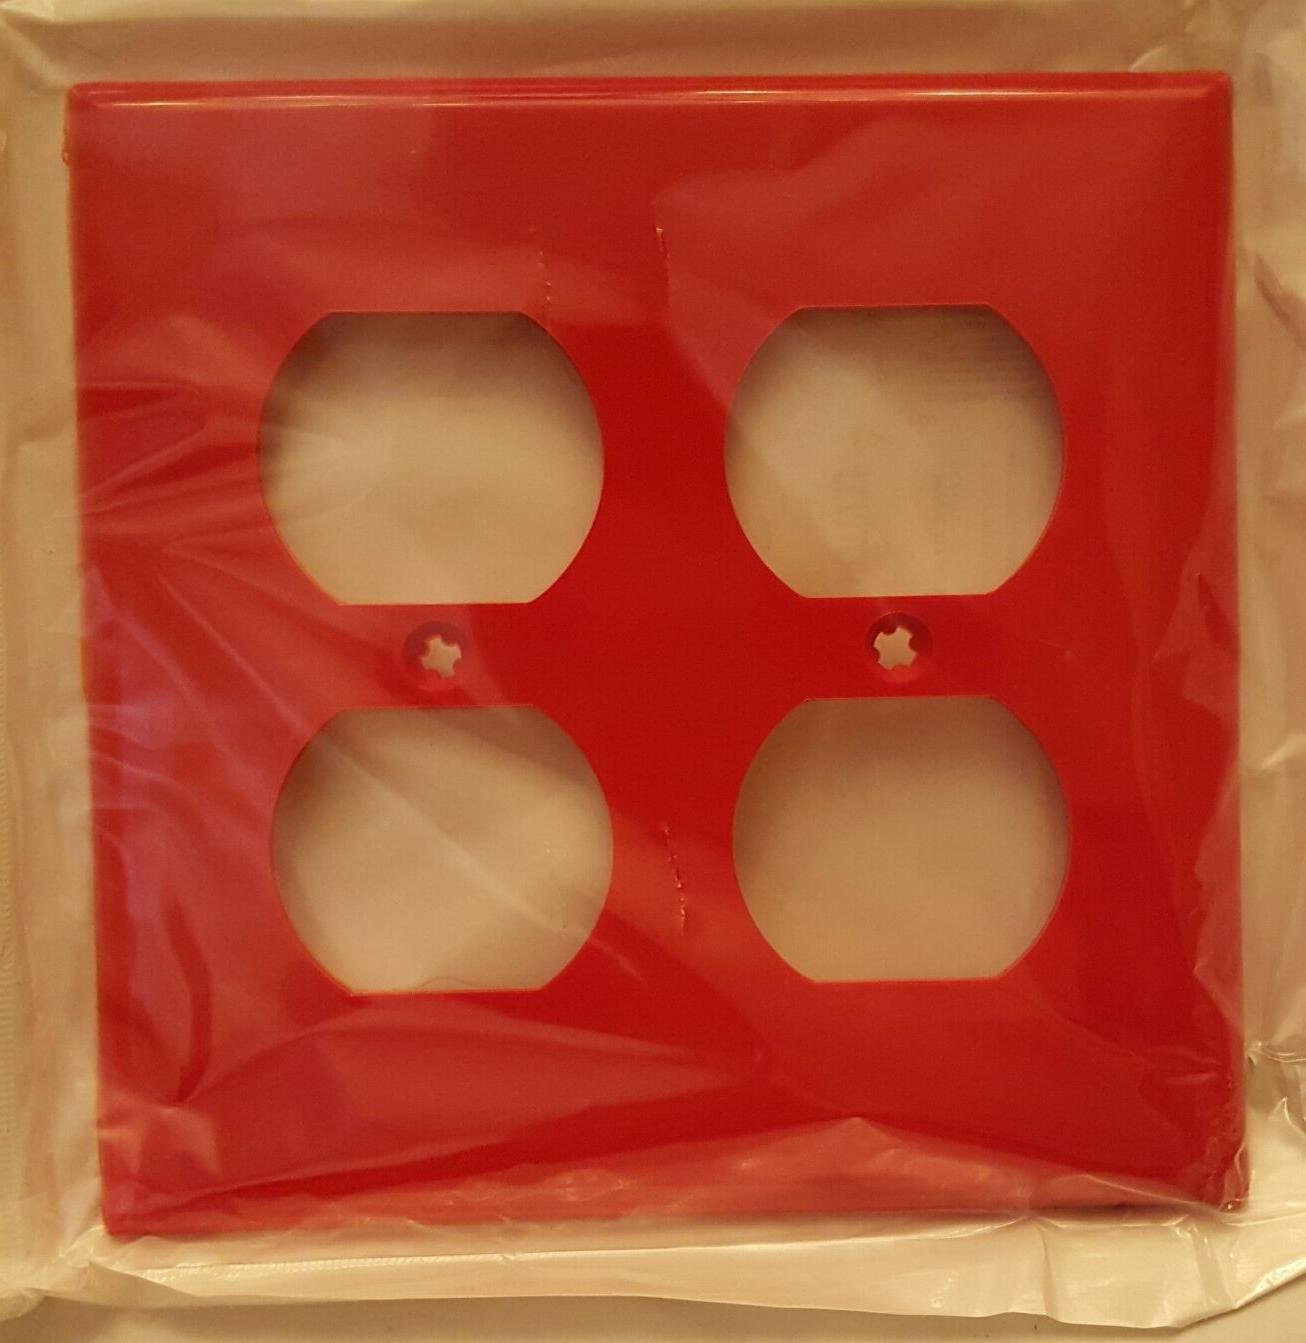 LEVITON 2-Gang Duplex Wallplate WALL PLATE RED 006-80716-00R